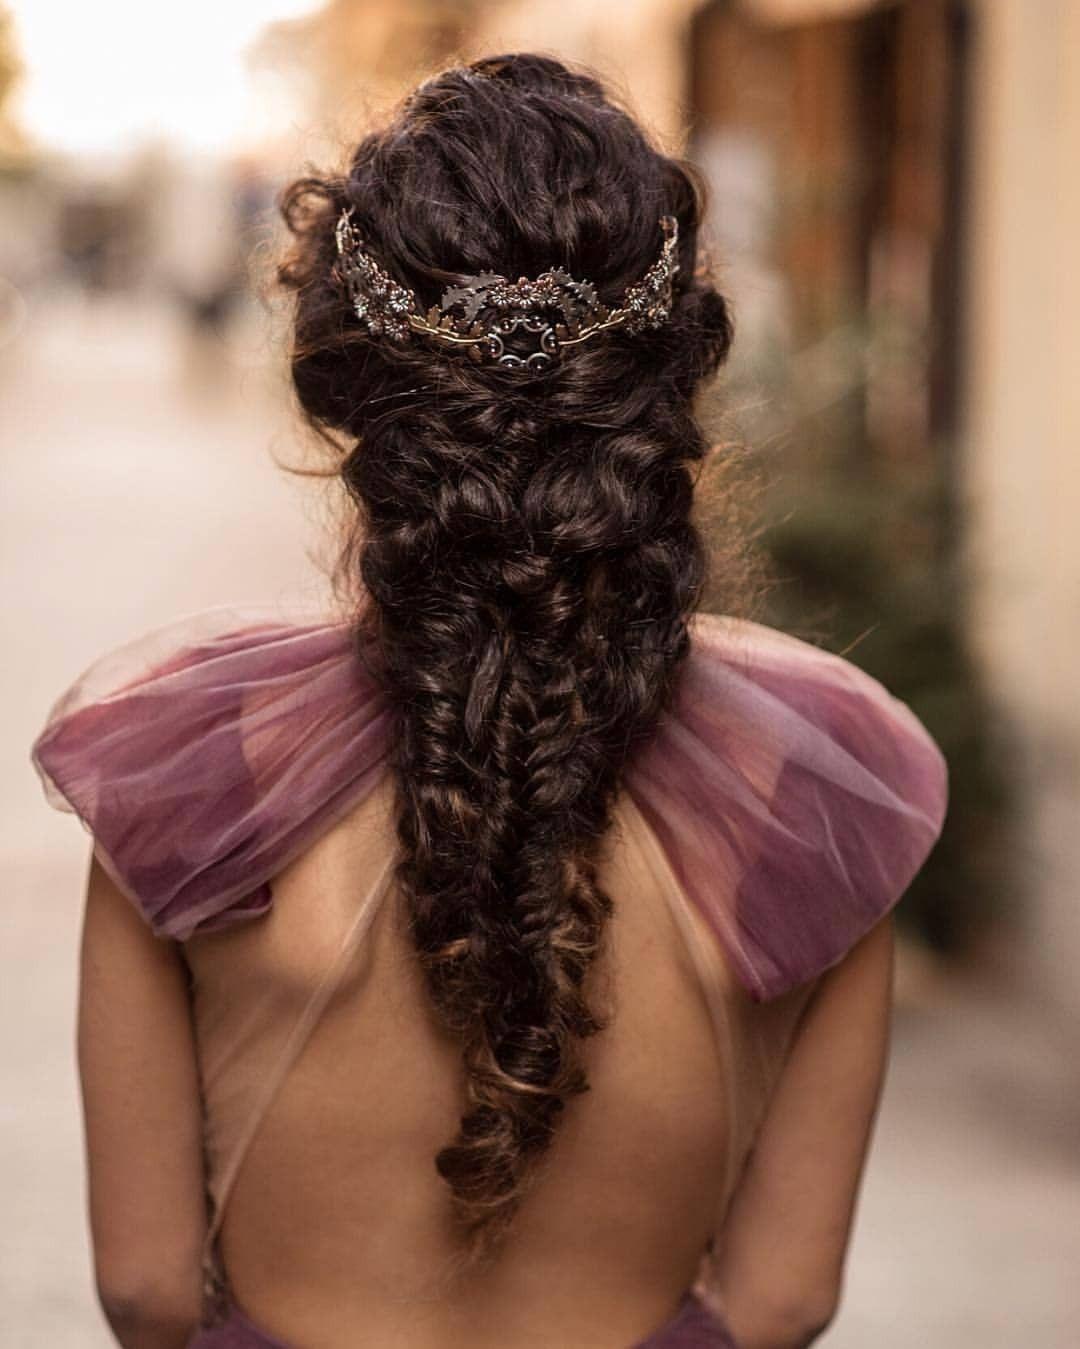 Hair Inspiration 2019-06-27 17:52:19